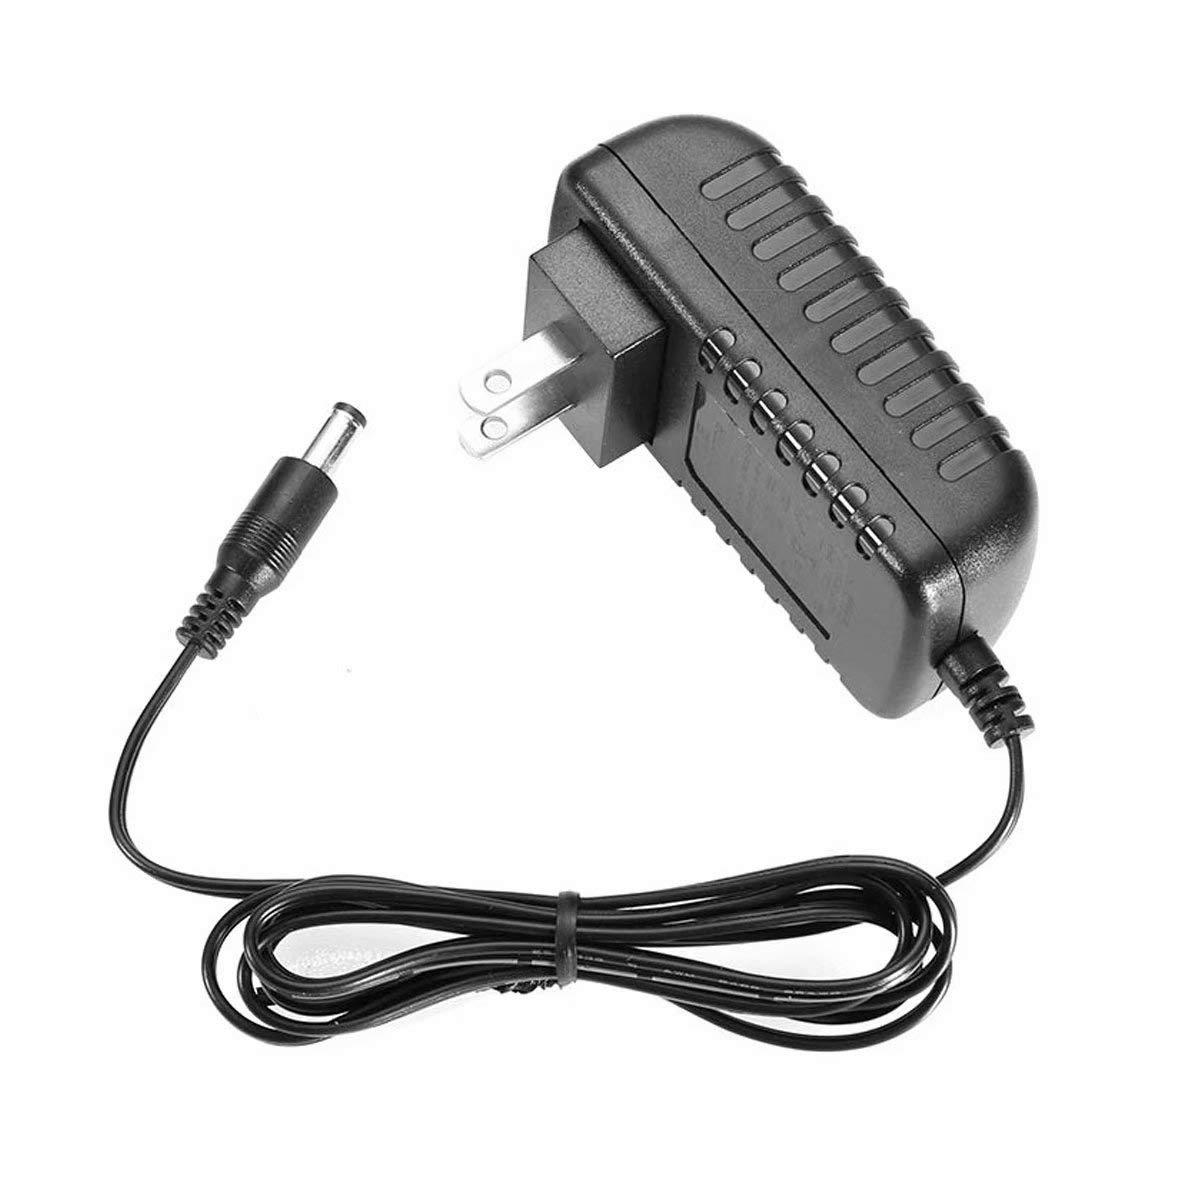 POWE-tech AC Adapter Charger Fr Xantrex Powerpack 200 300 300i 400 Plus Power Jump Starter